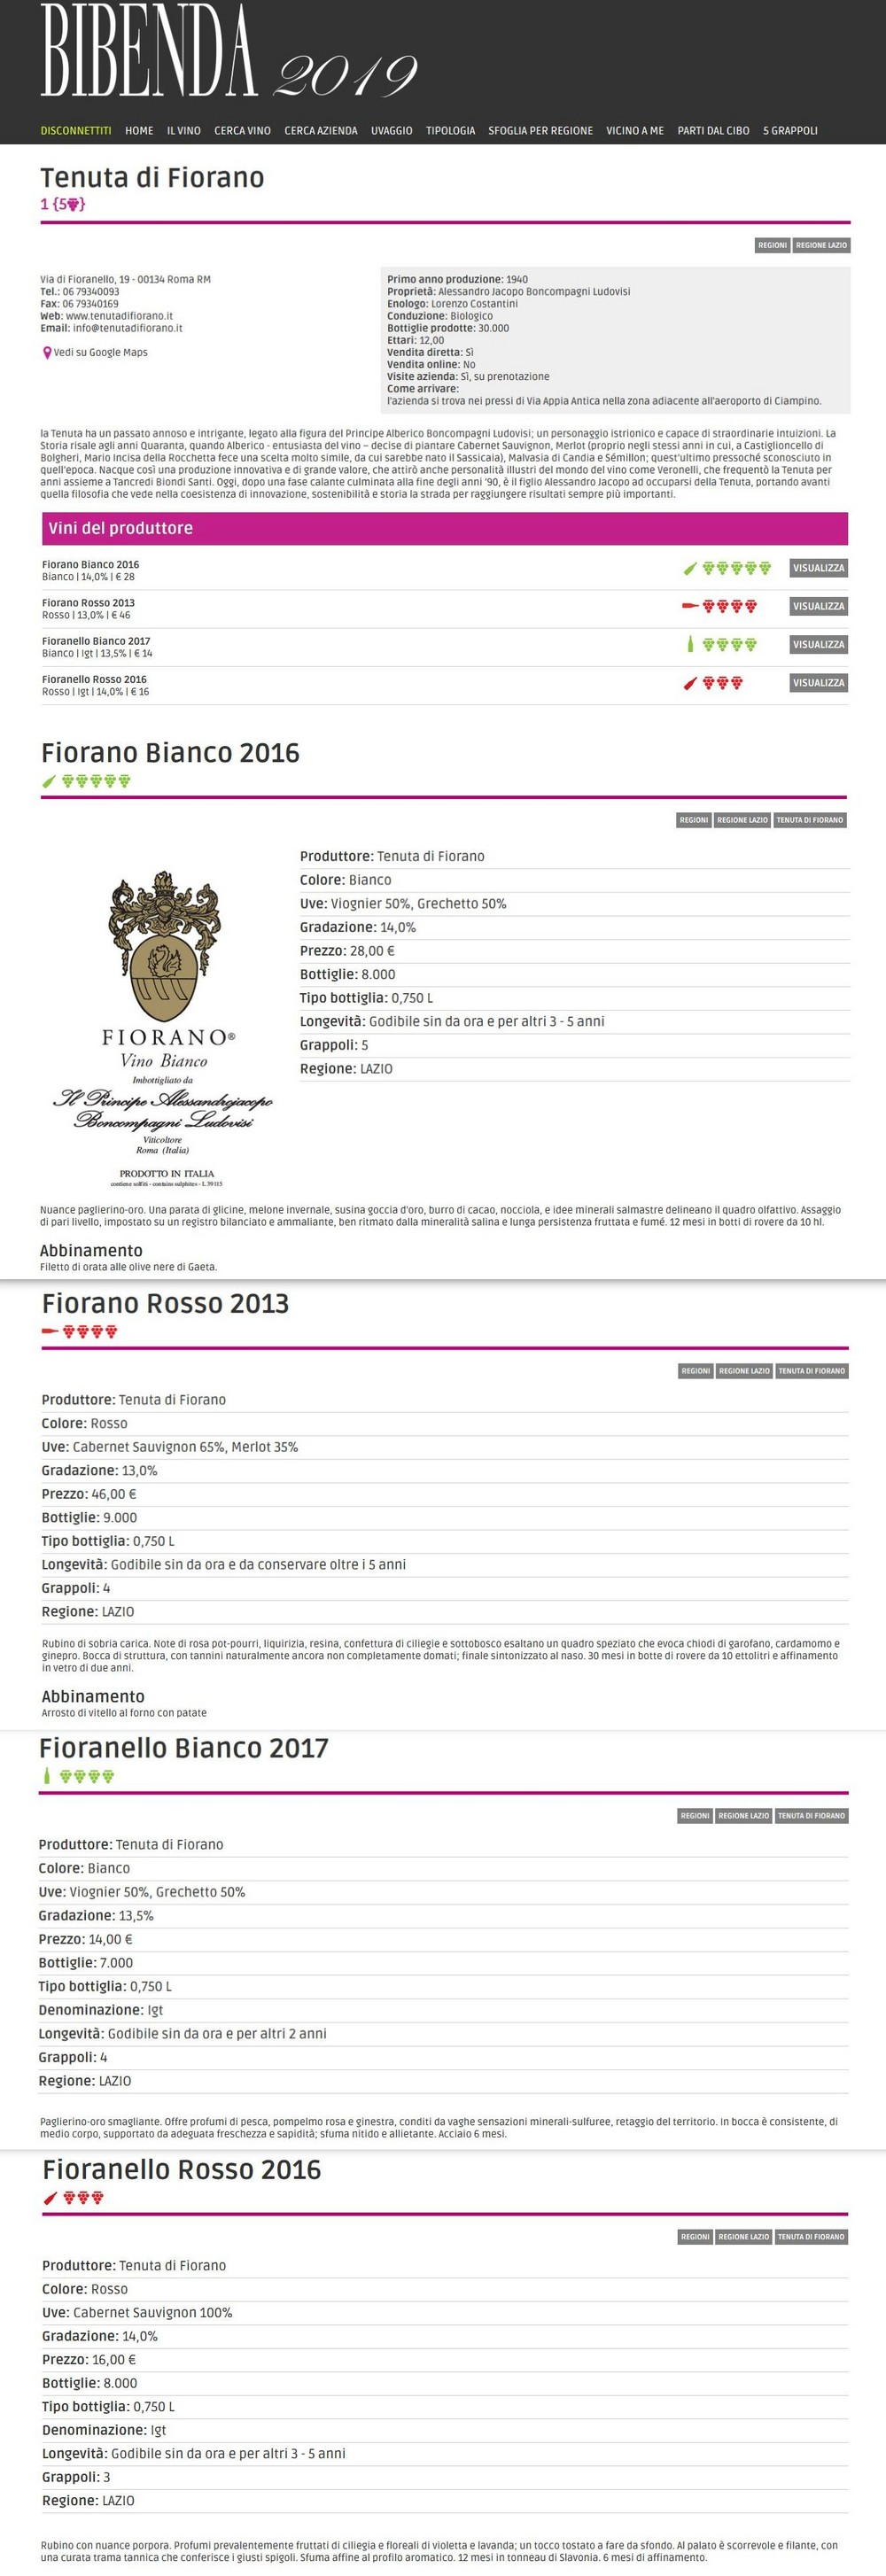 Bibenda 2019 - Guida Fondazione Italiana Sommelier